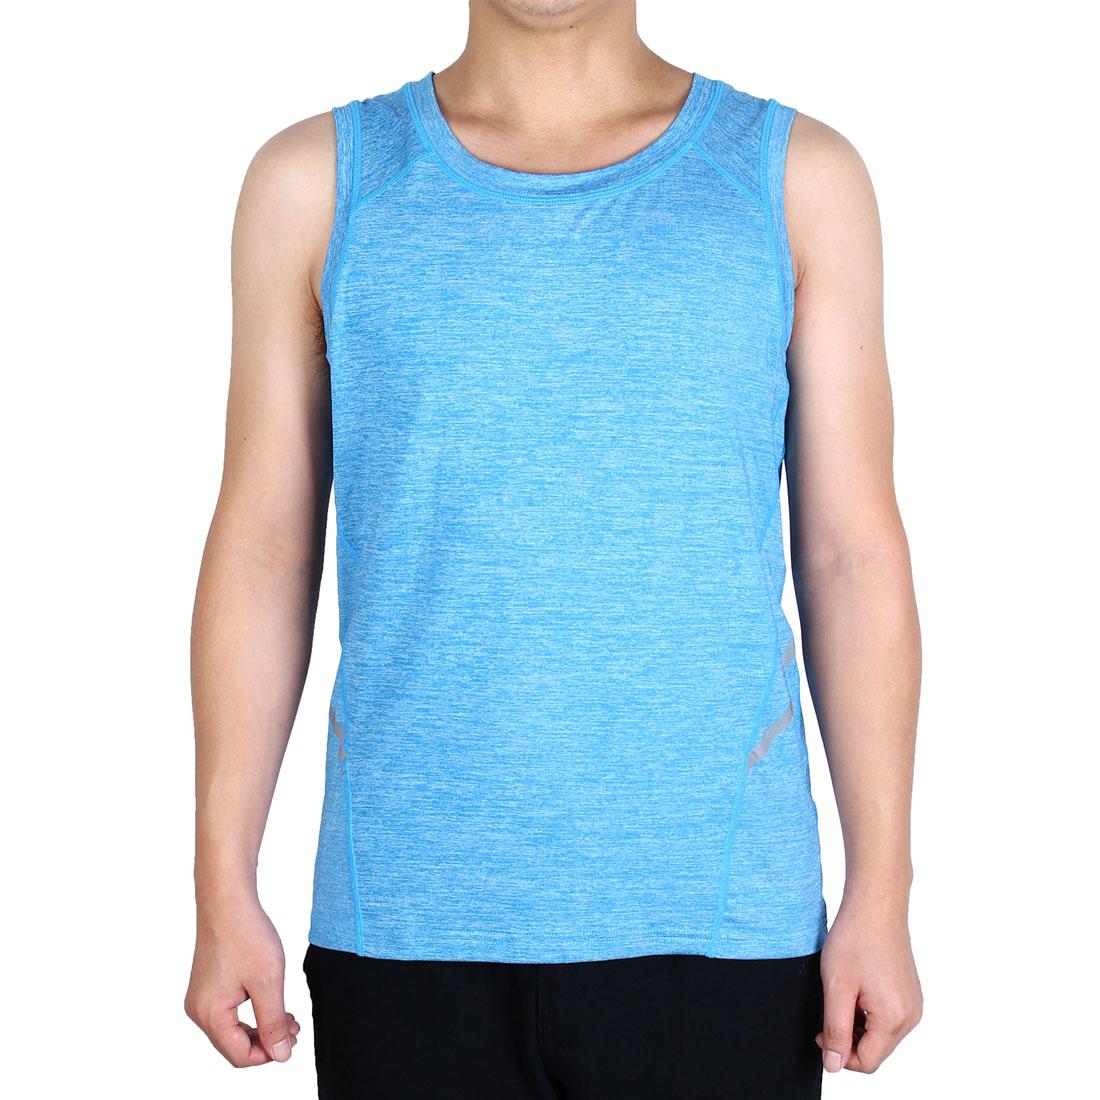 Men Sleeveless T-shirt Activewear Vest Training Exercise Sports Tank Top Blue M